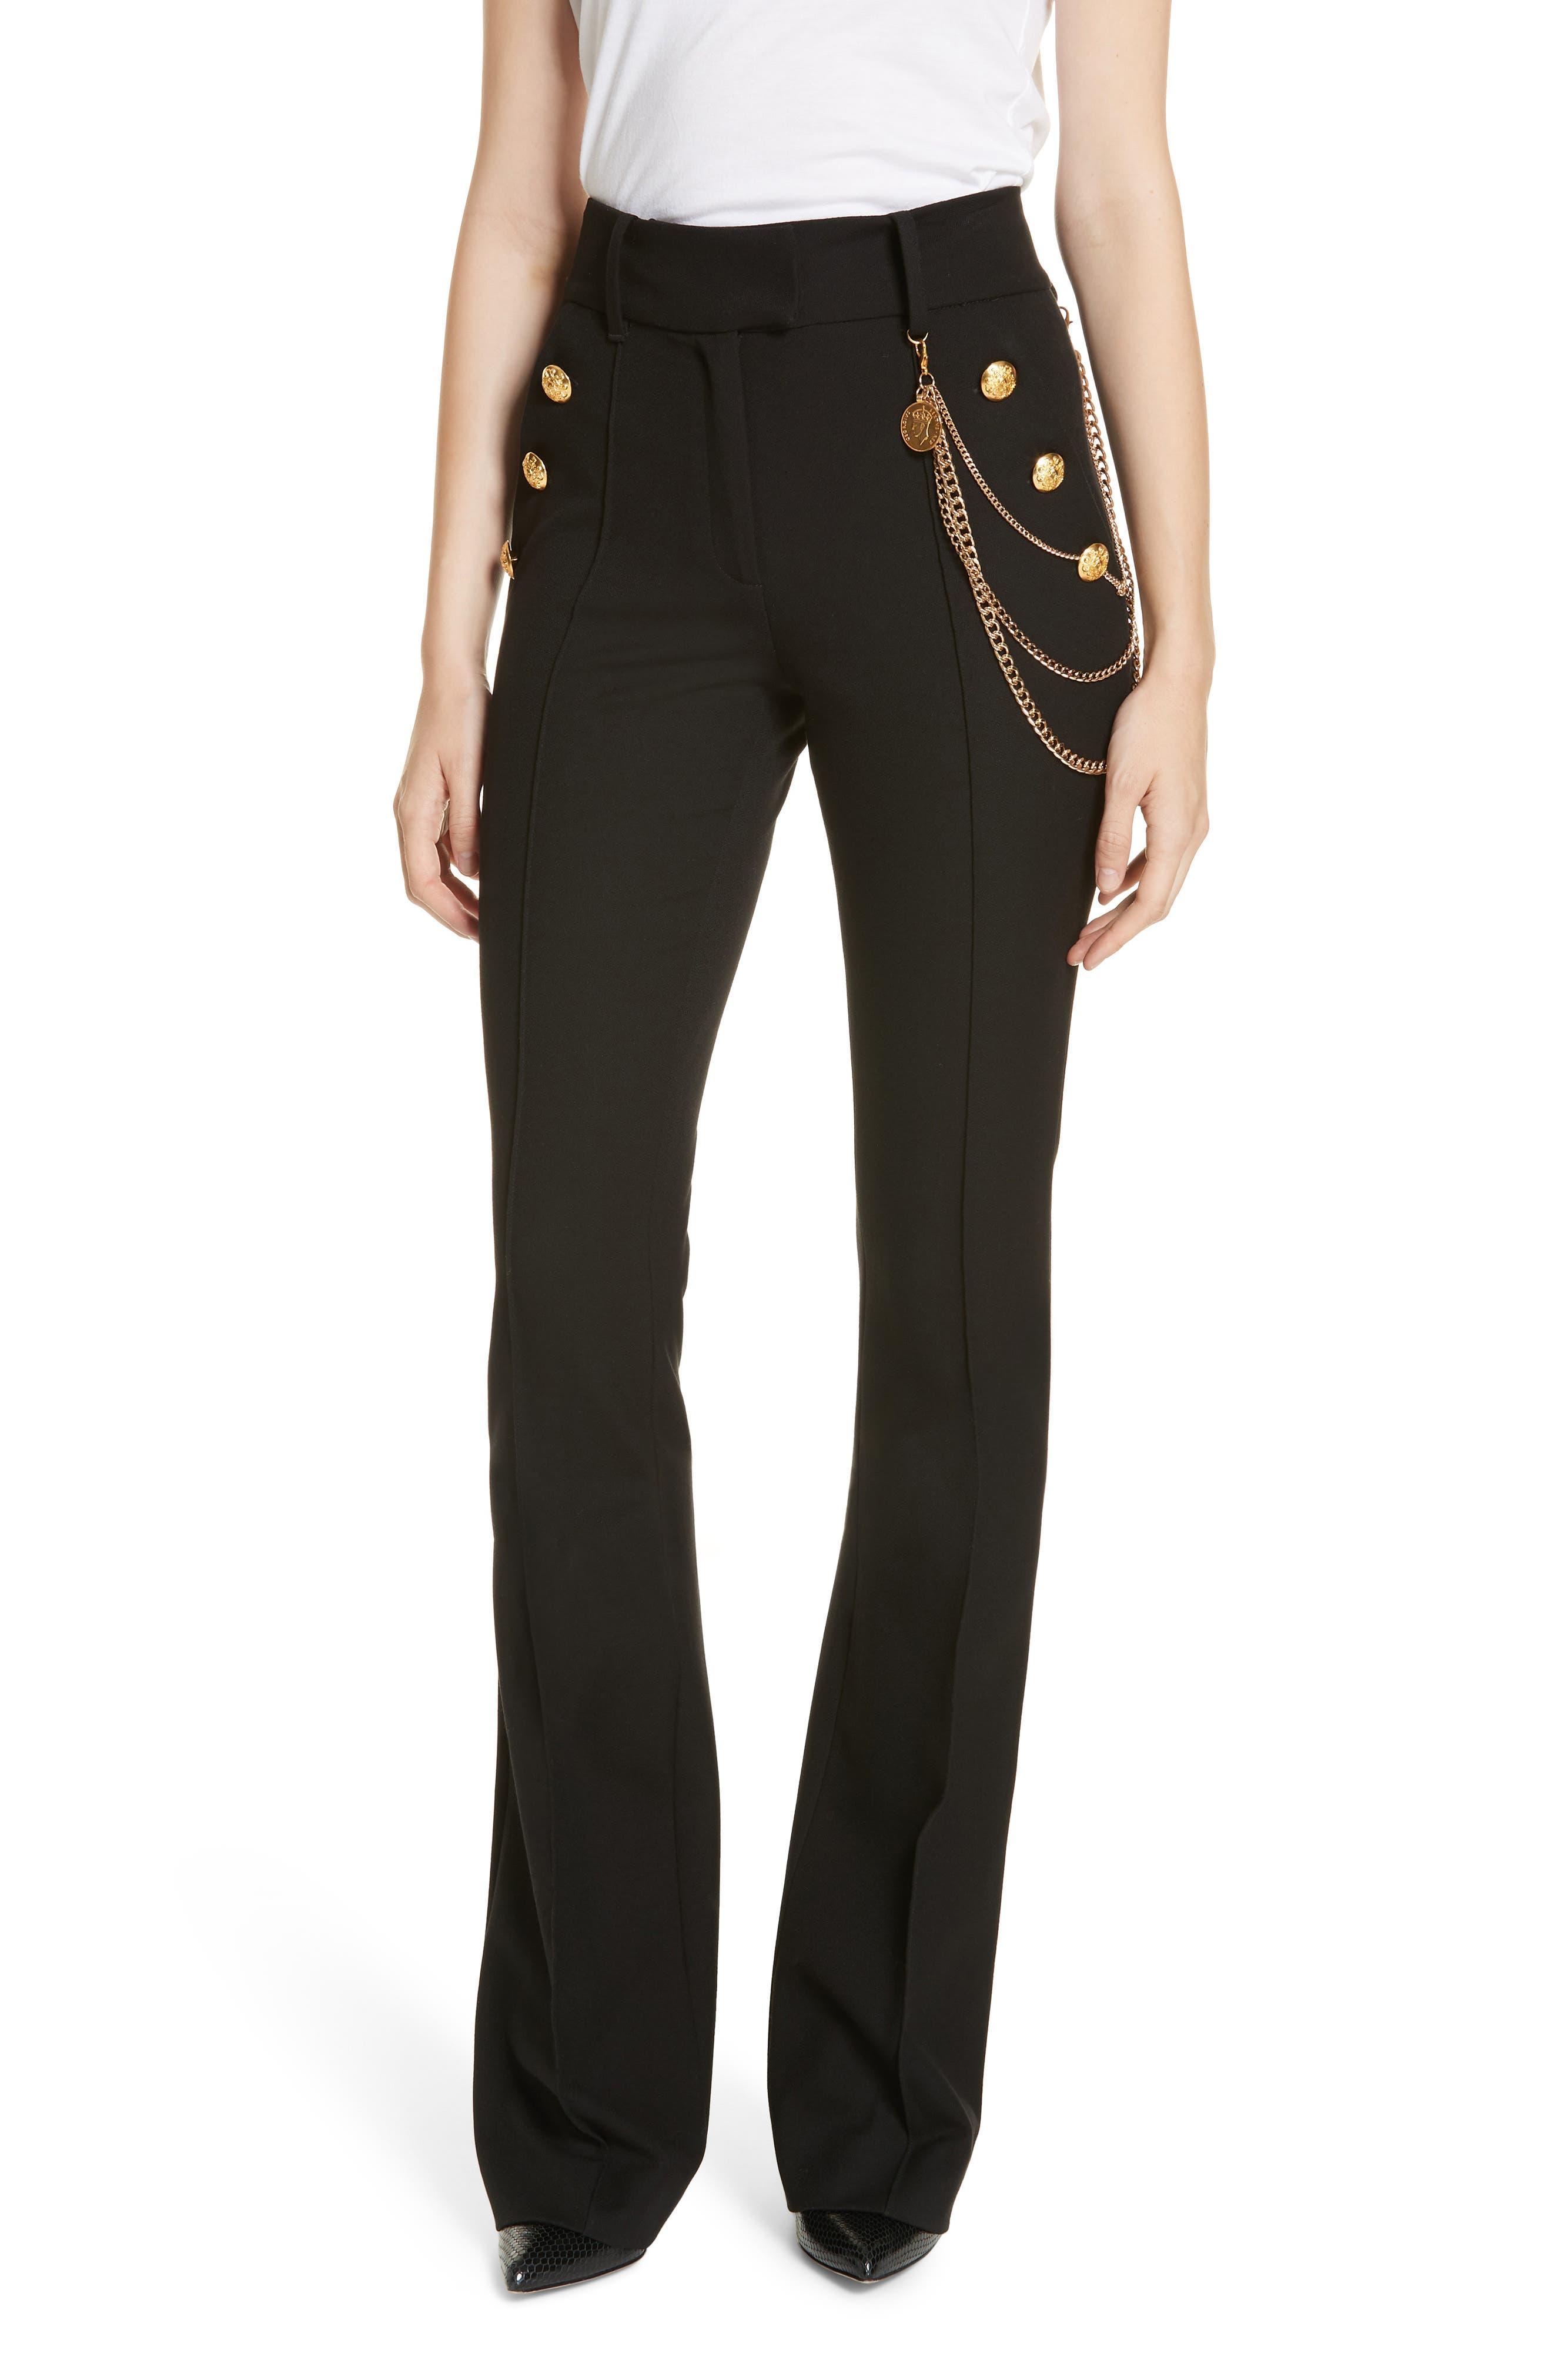 Alair Chain Detail Sailor Trousers,                             Main thumbnail 1, color,                             BLACK